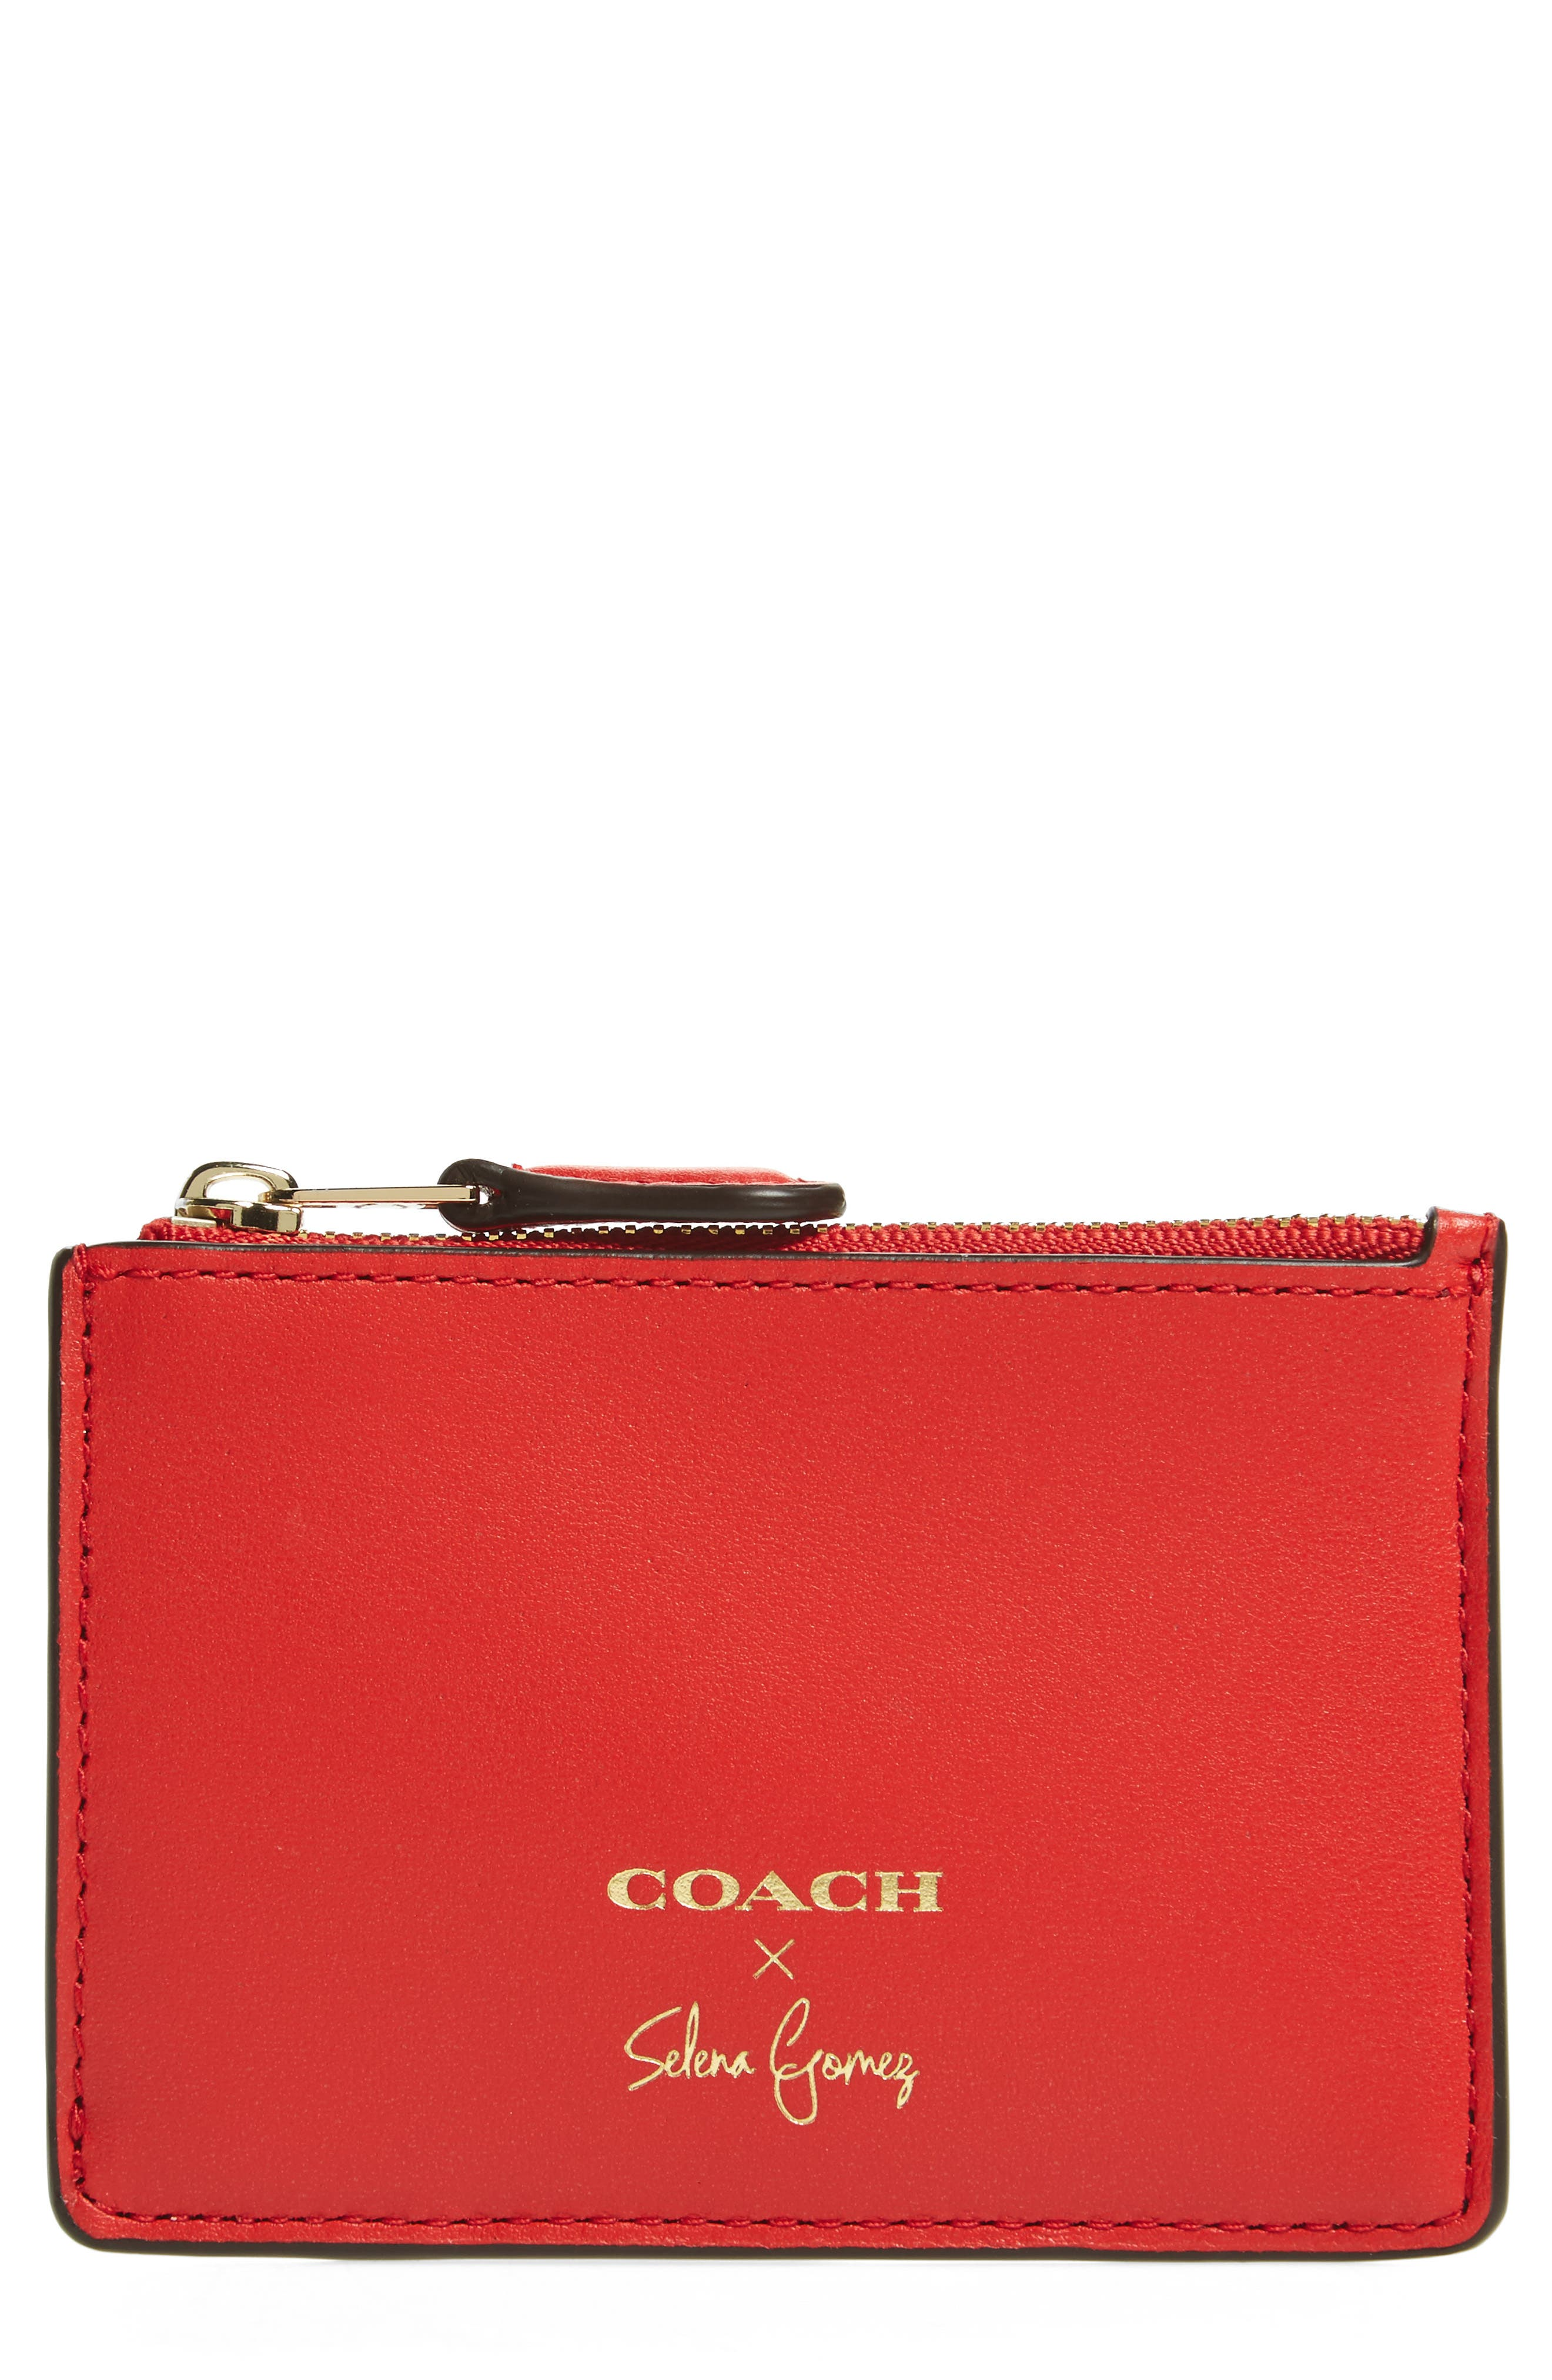 x Selena Gomez Mini Skinny Leather Card Case,                         Main,                         color, Red